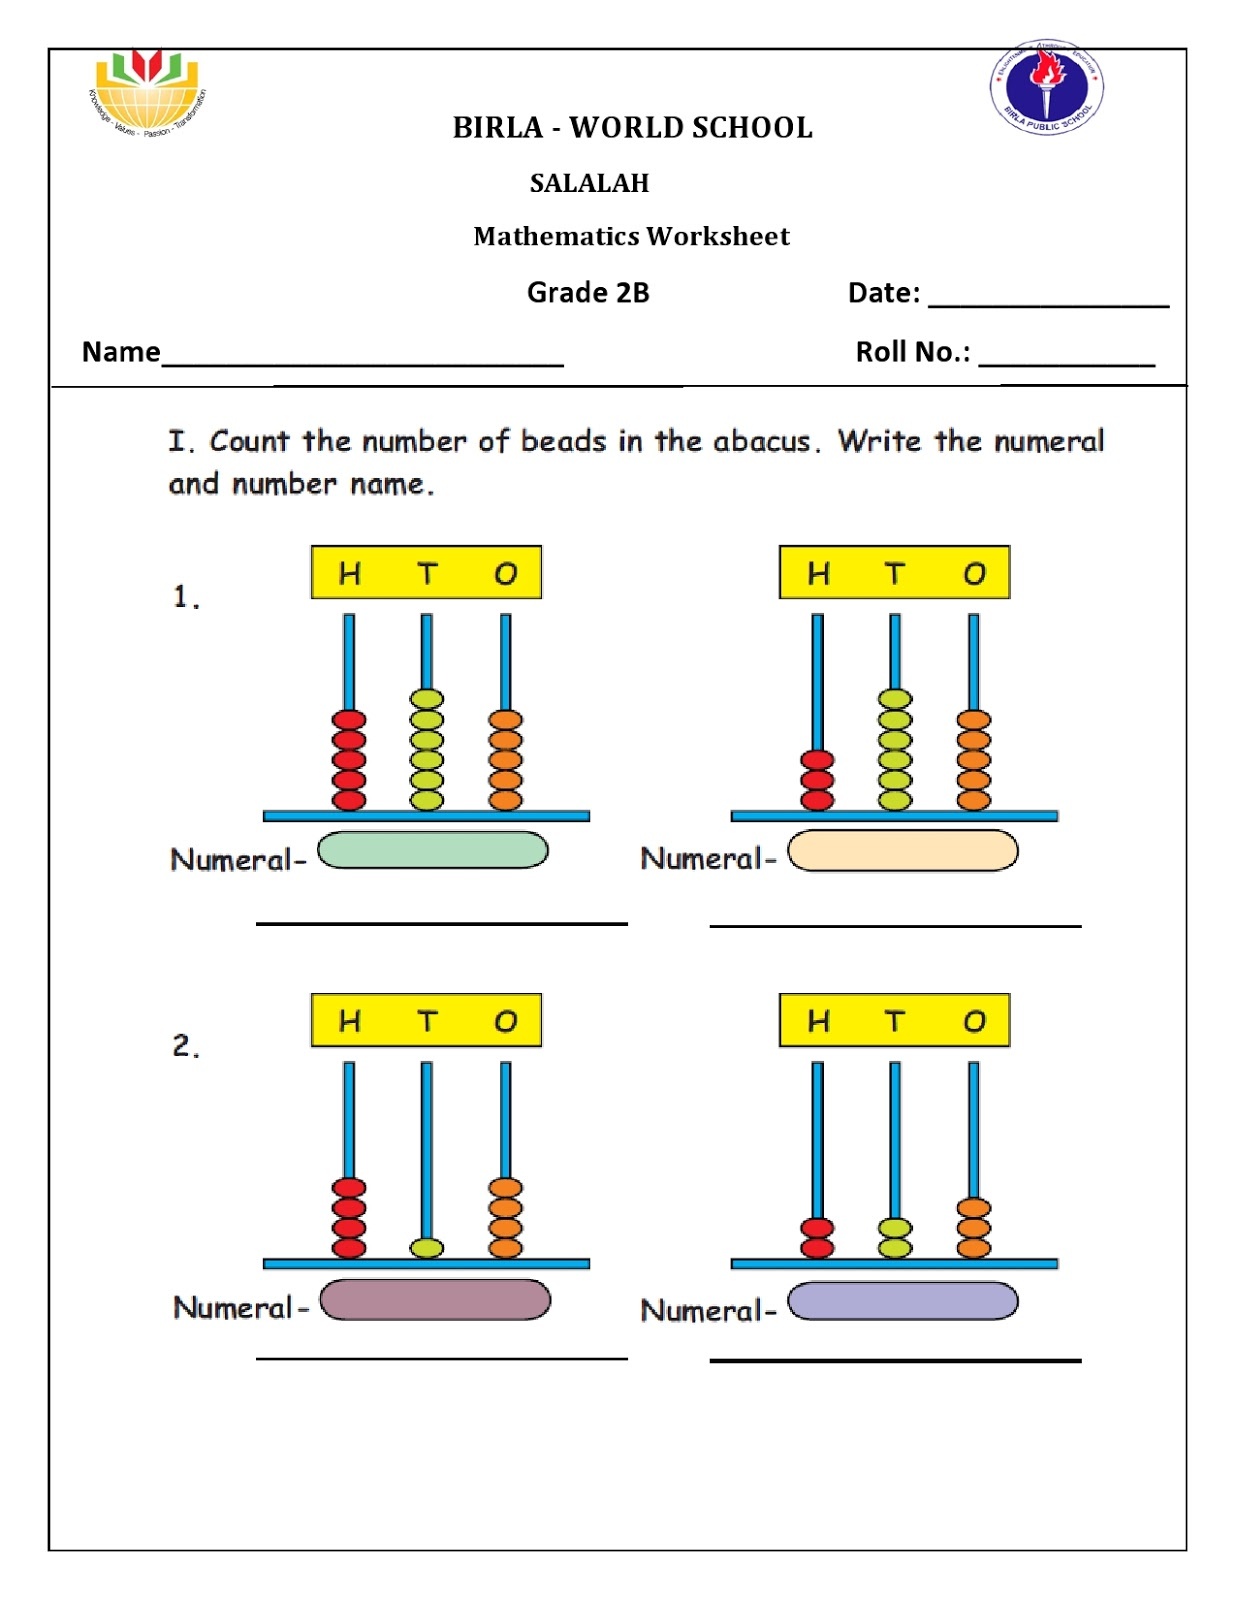 Birla World School Oman Homework For Grade 2 B On 25 08 16